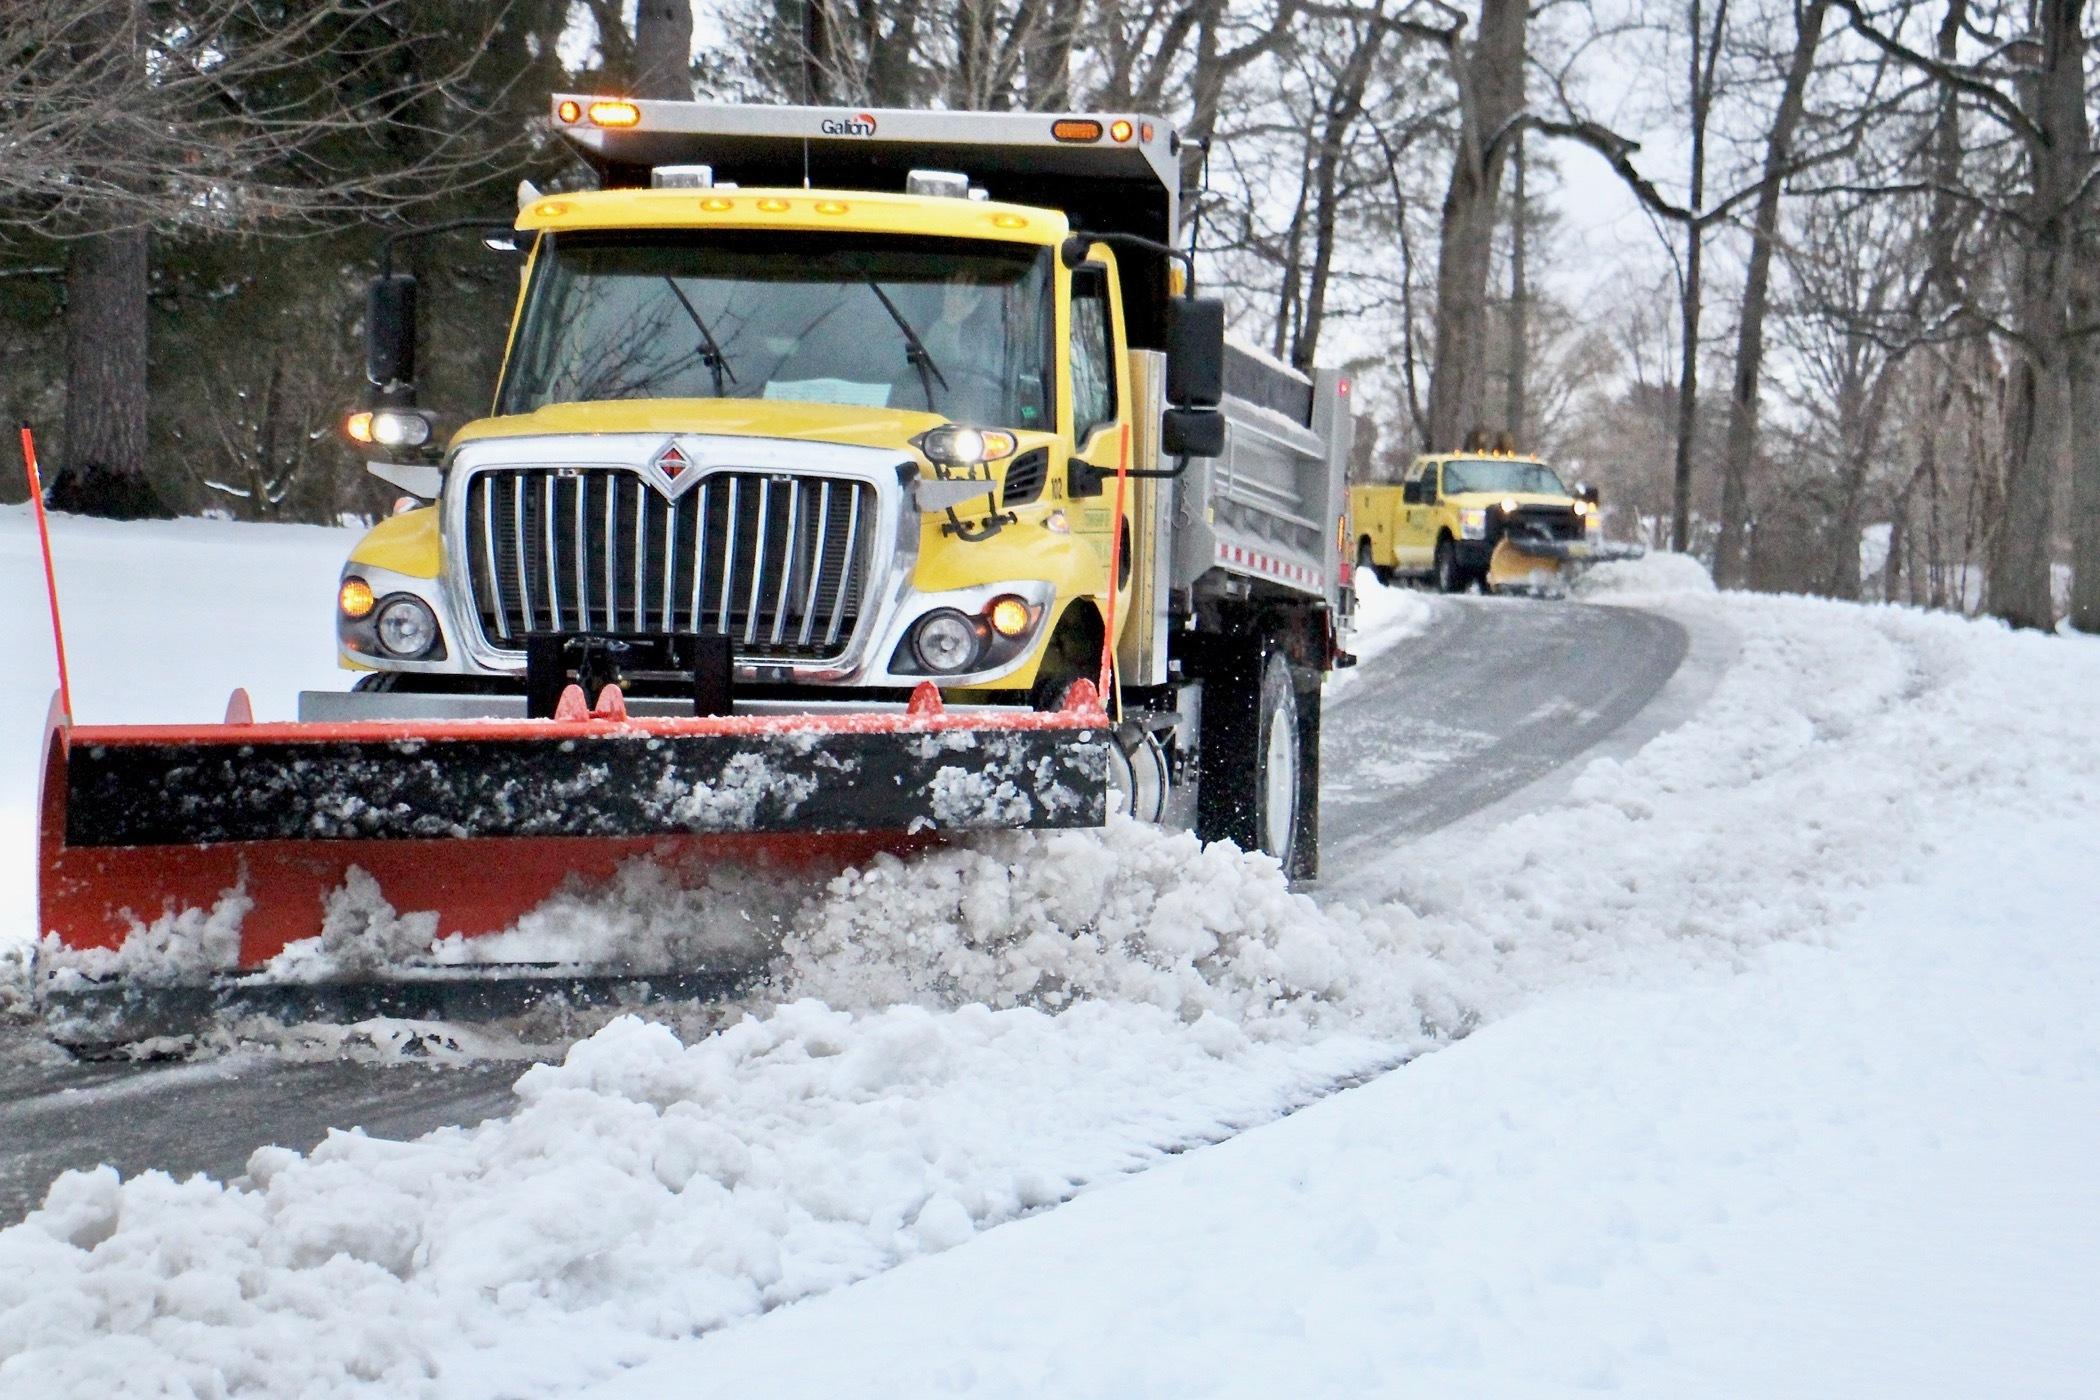 Plows clear the roads in Moorestown, N.J.